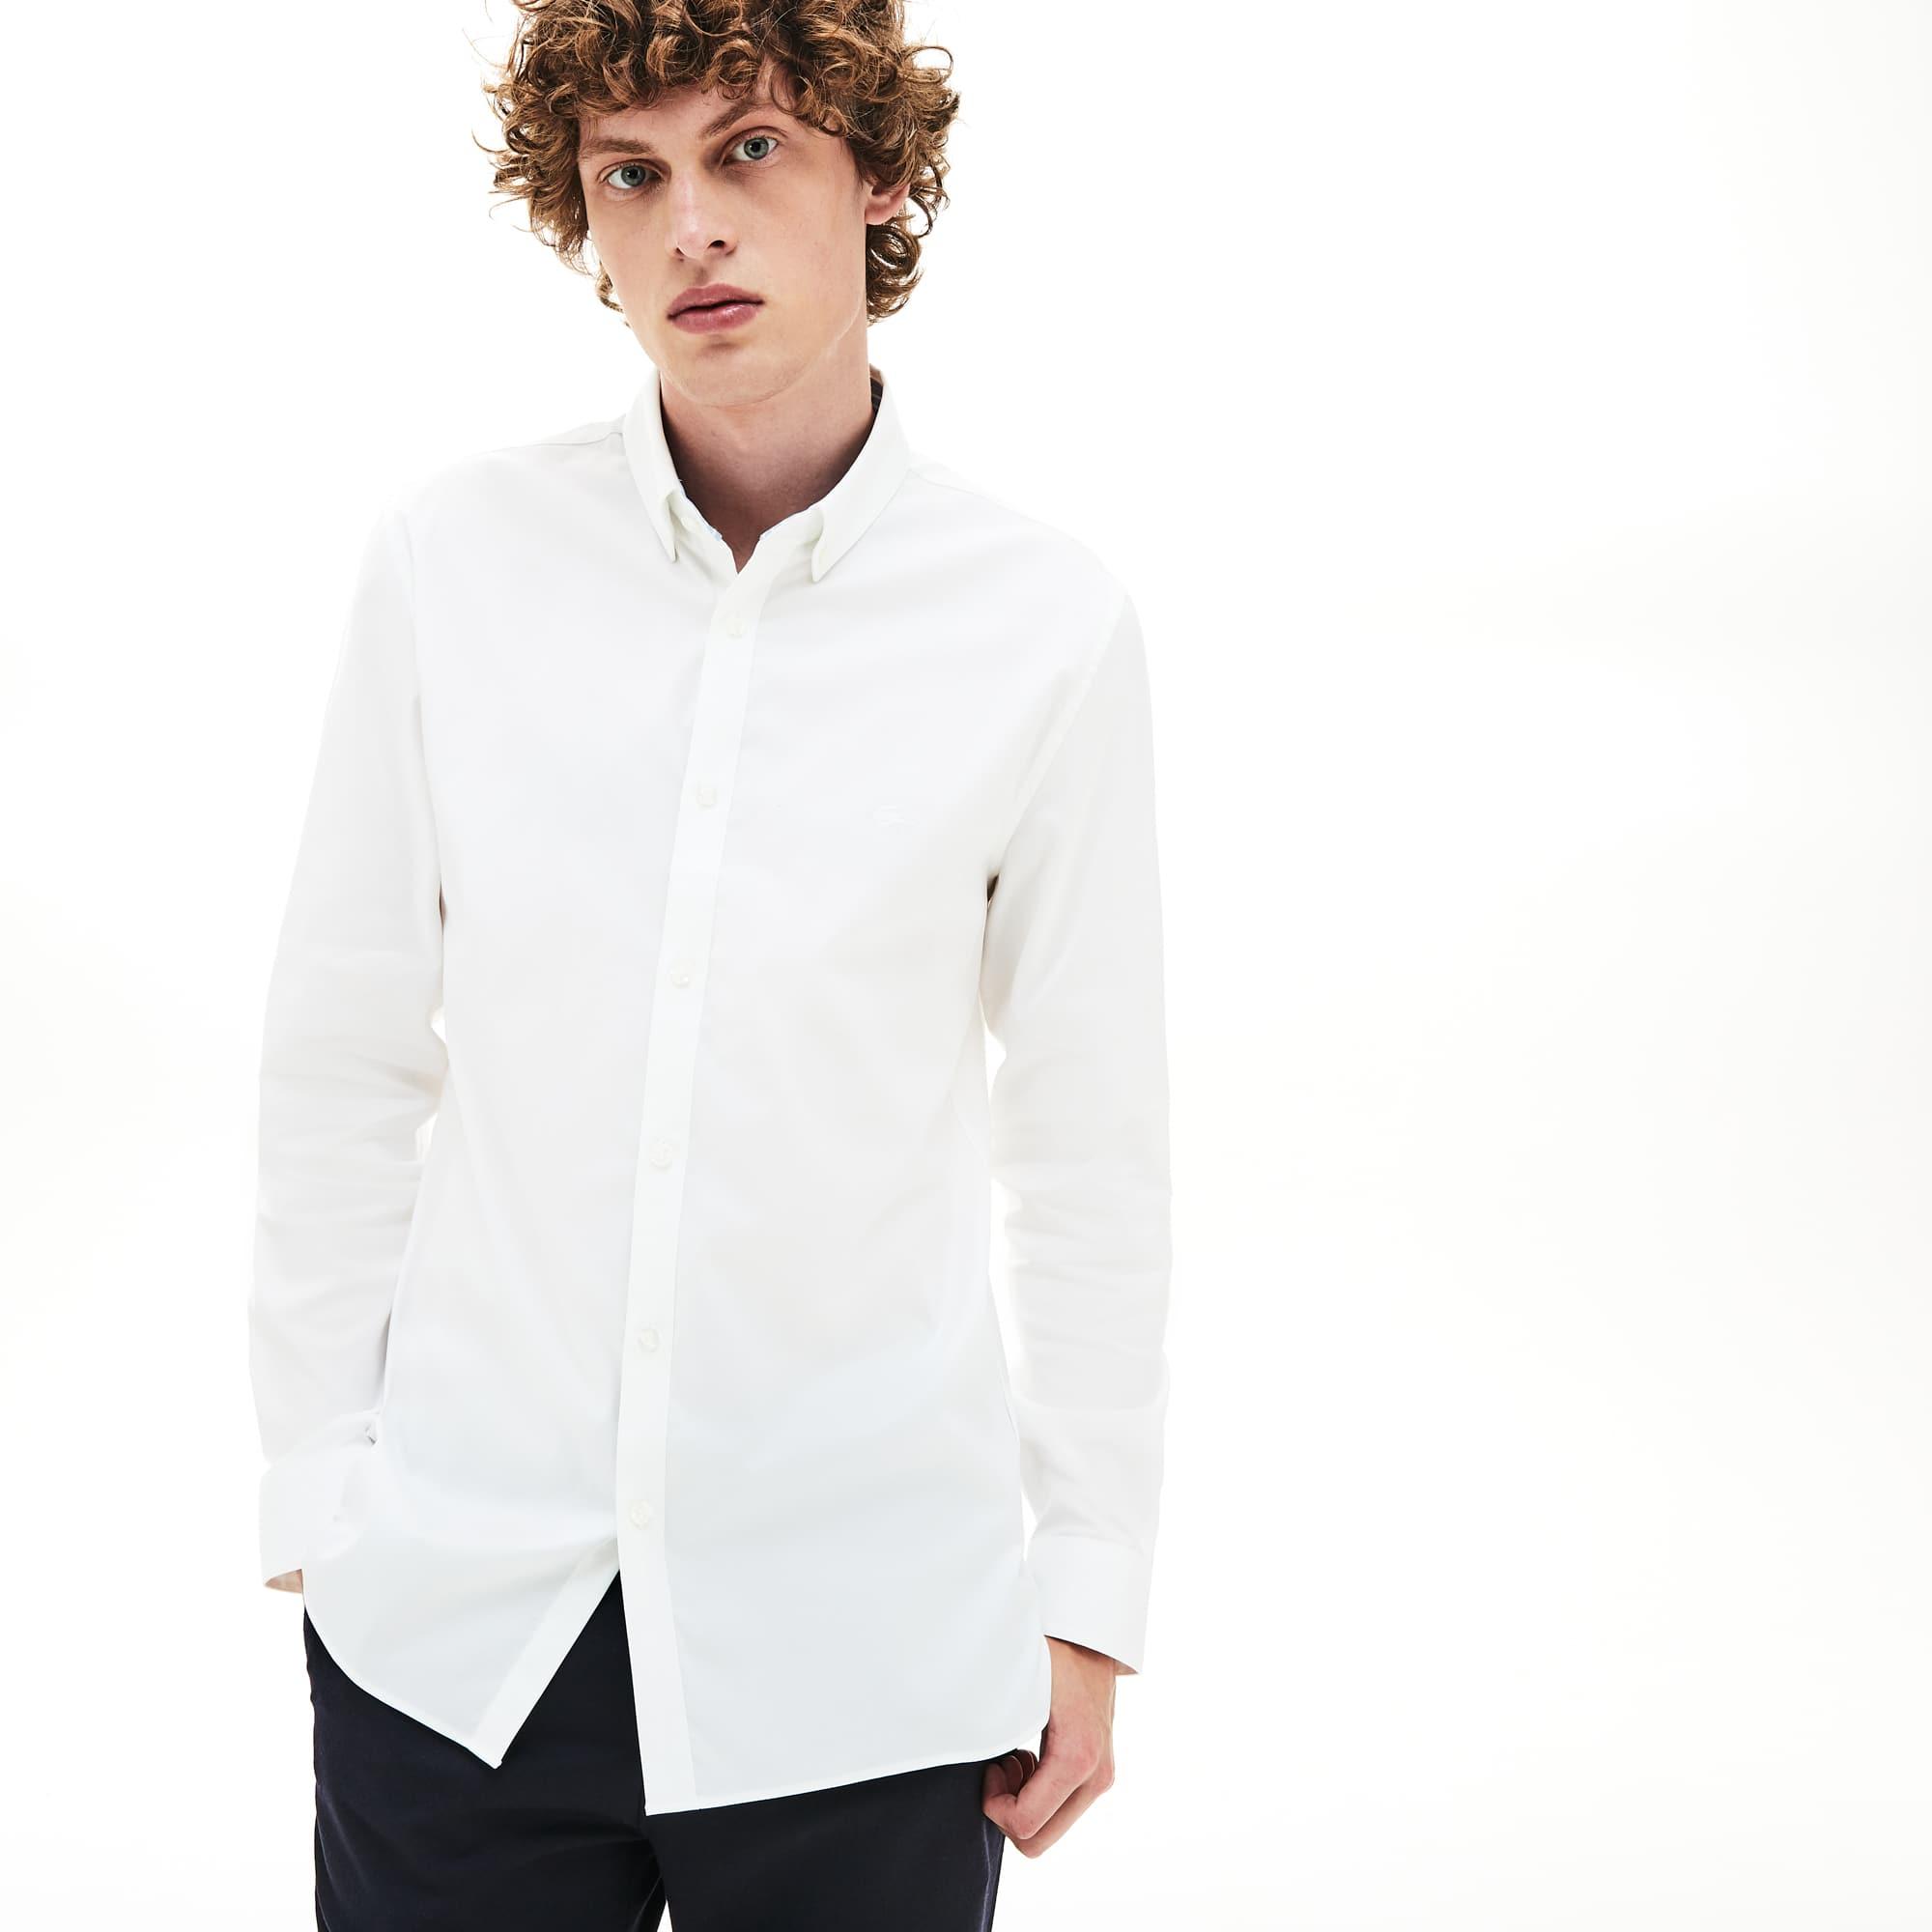 Chemises Chemises Lacoste Chemises HommeVêtements HommeVêtements HommeVêtements Chemises Chemises Lacoste HommeVêtements Lacoste Lacoste D9IWHYE2